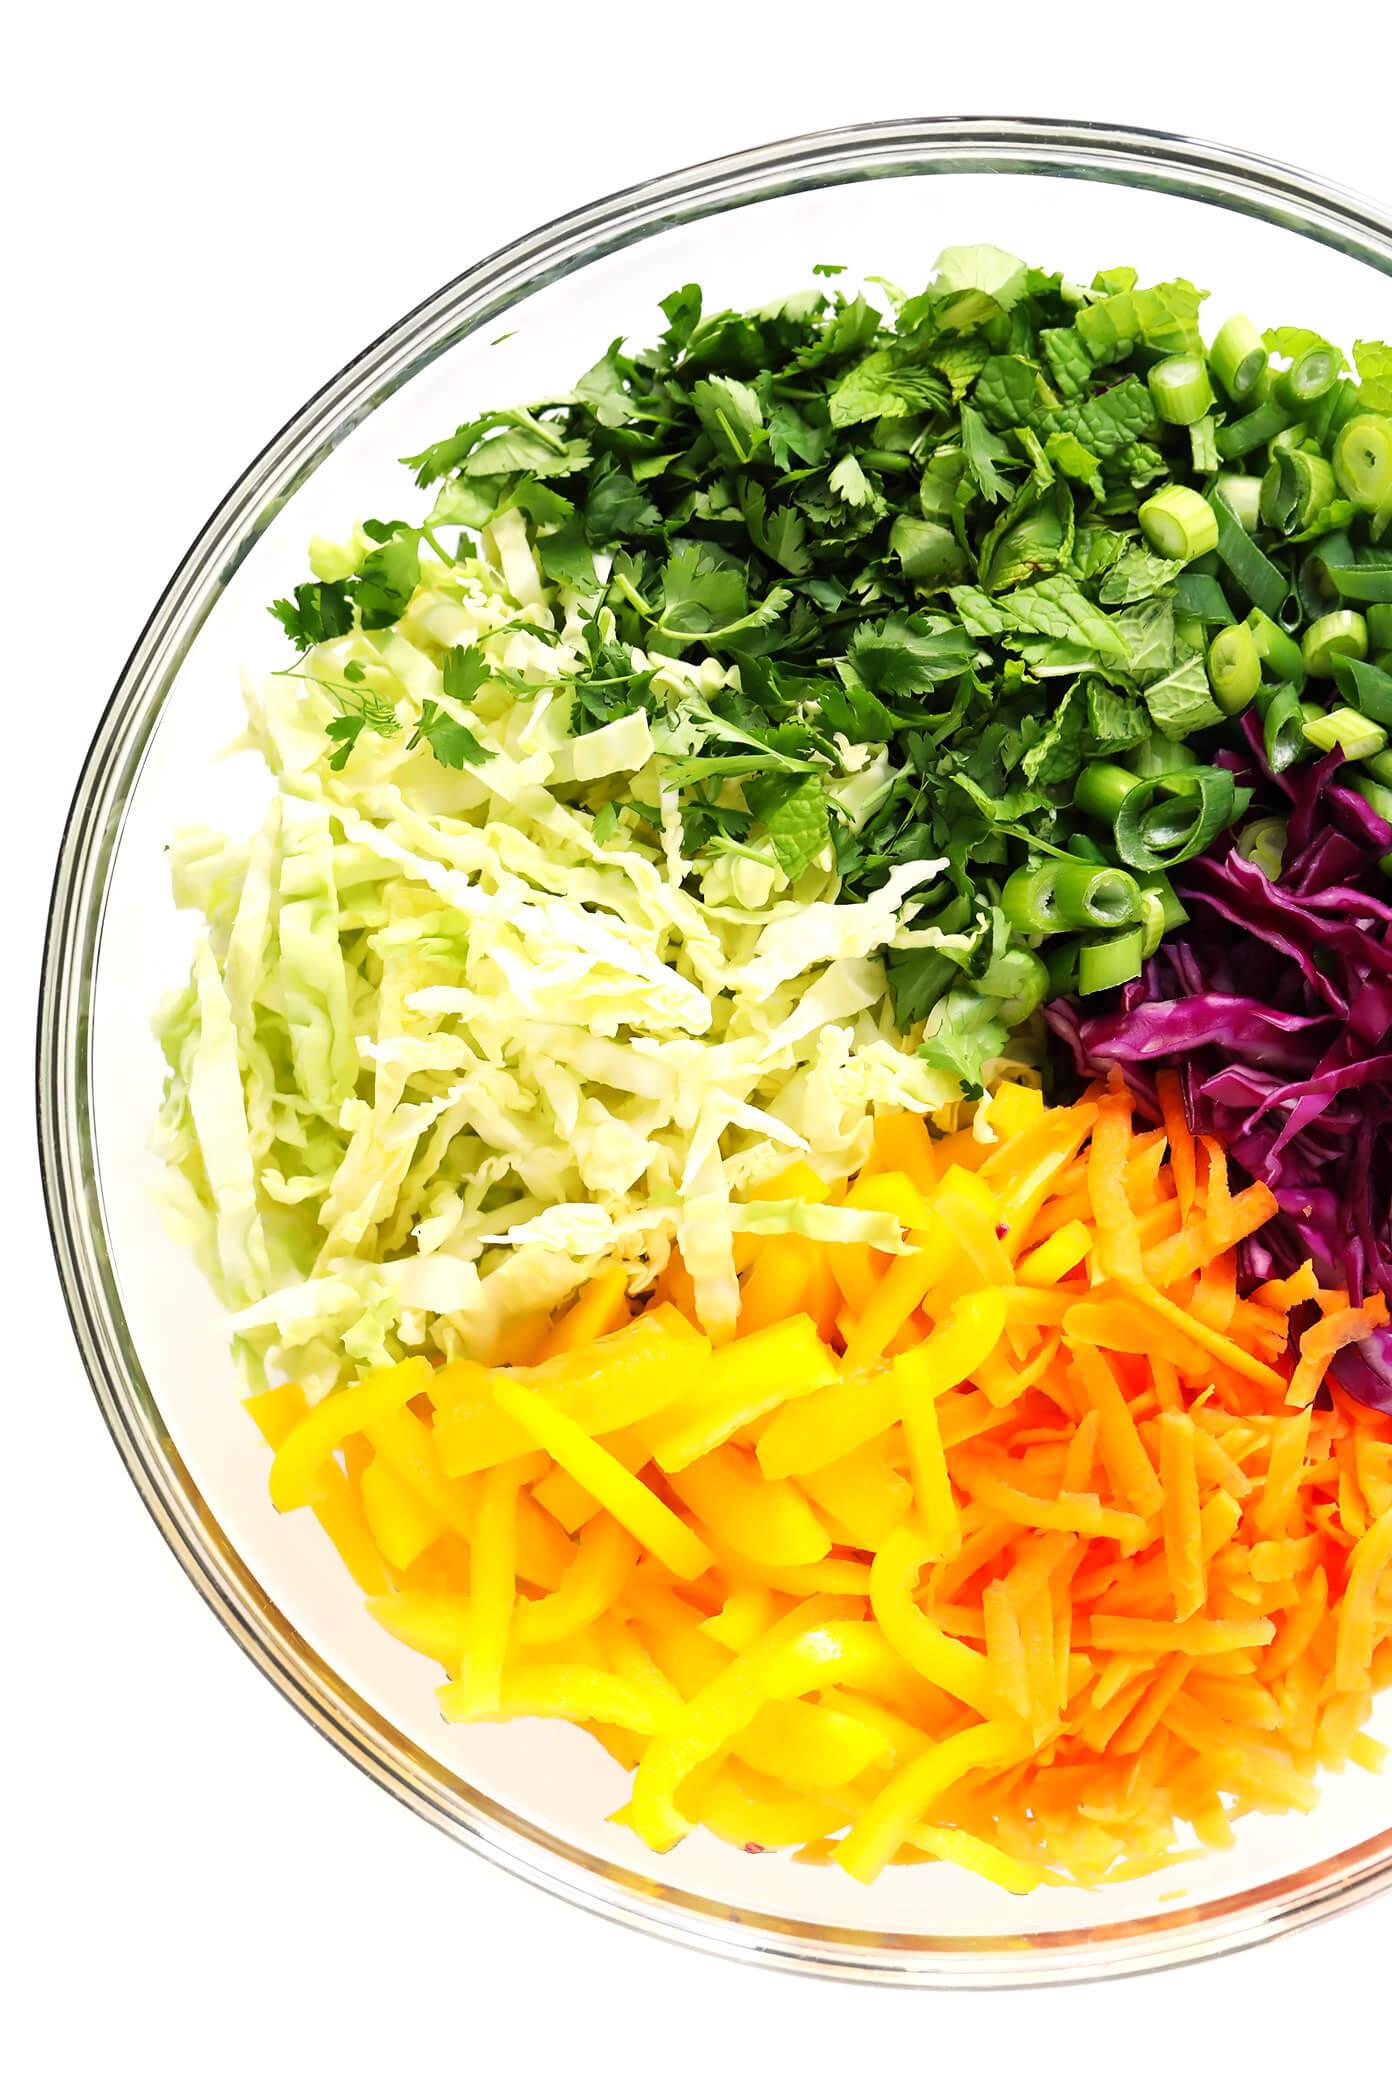 Easy Asian Salad Ingredients